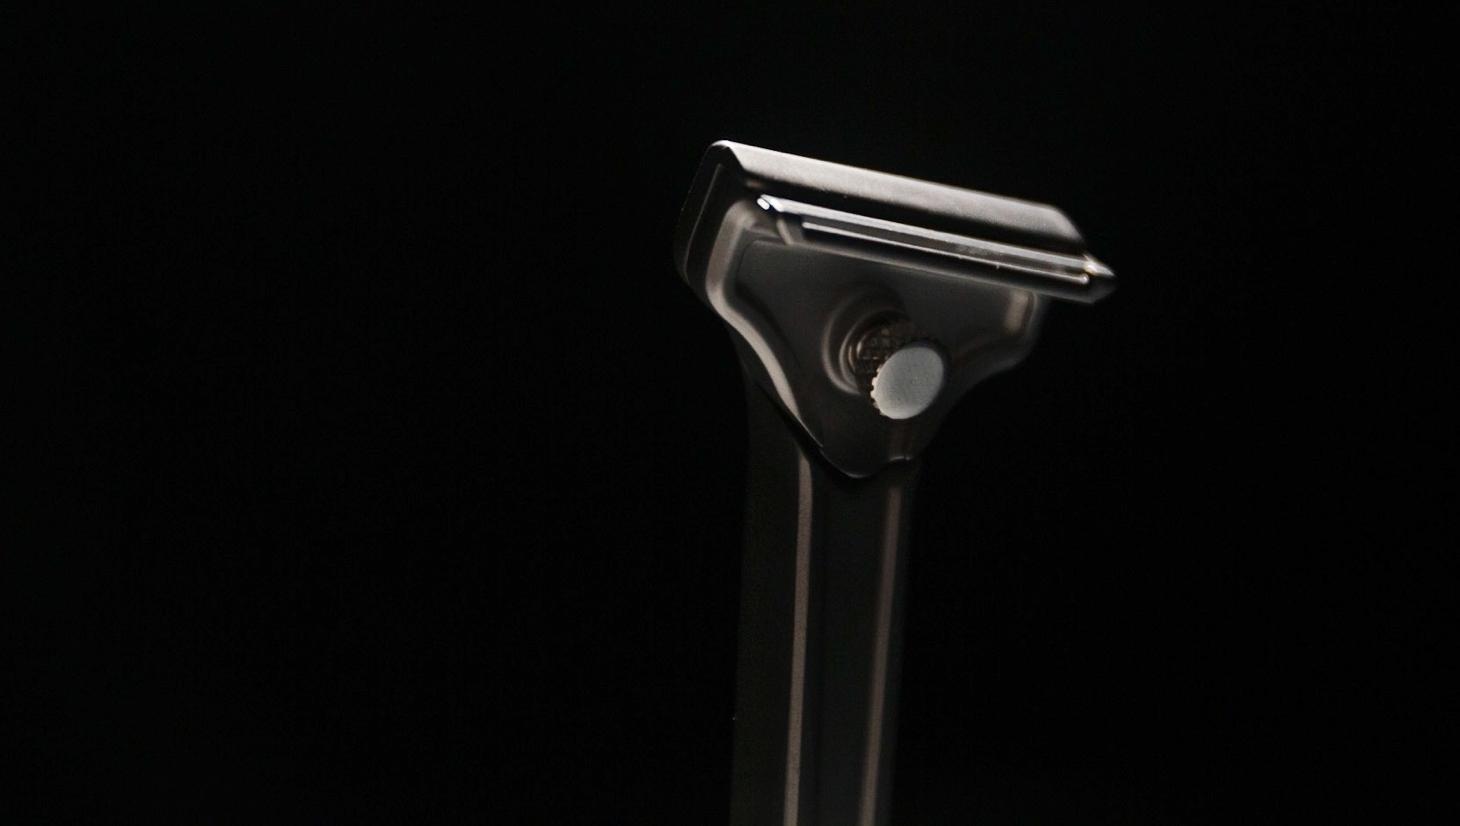 Single-blade razor